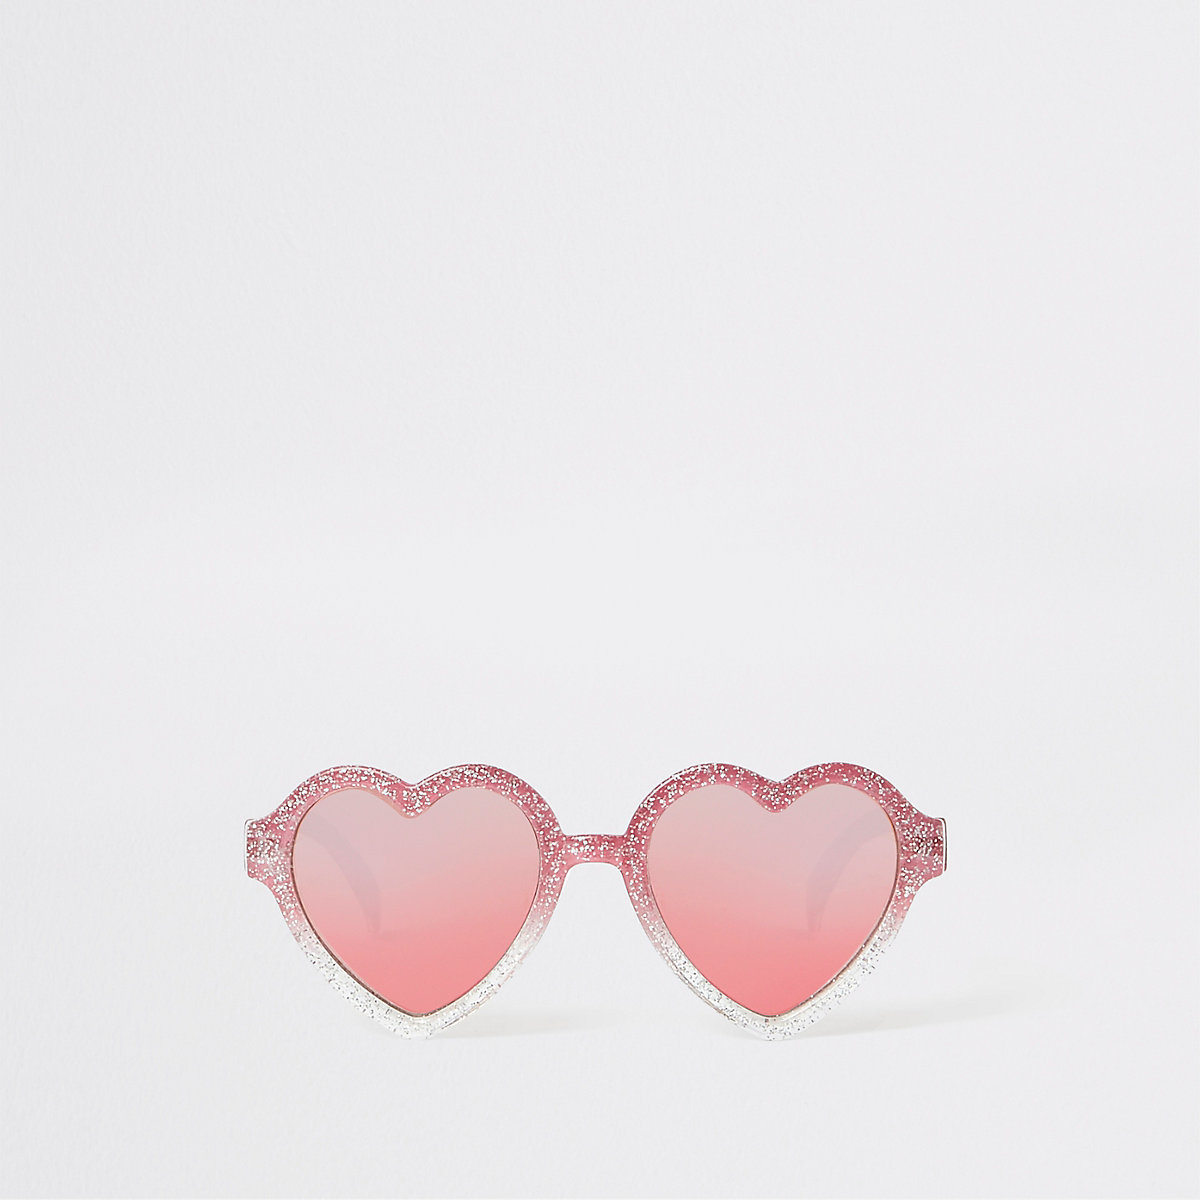 b61dc27223a Mini girls pink glitter heart sunglasses - Baby Girls Accessories - Mini  Girls - girls